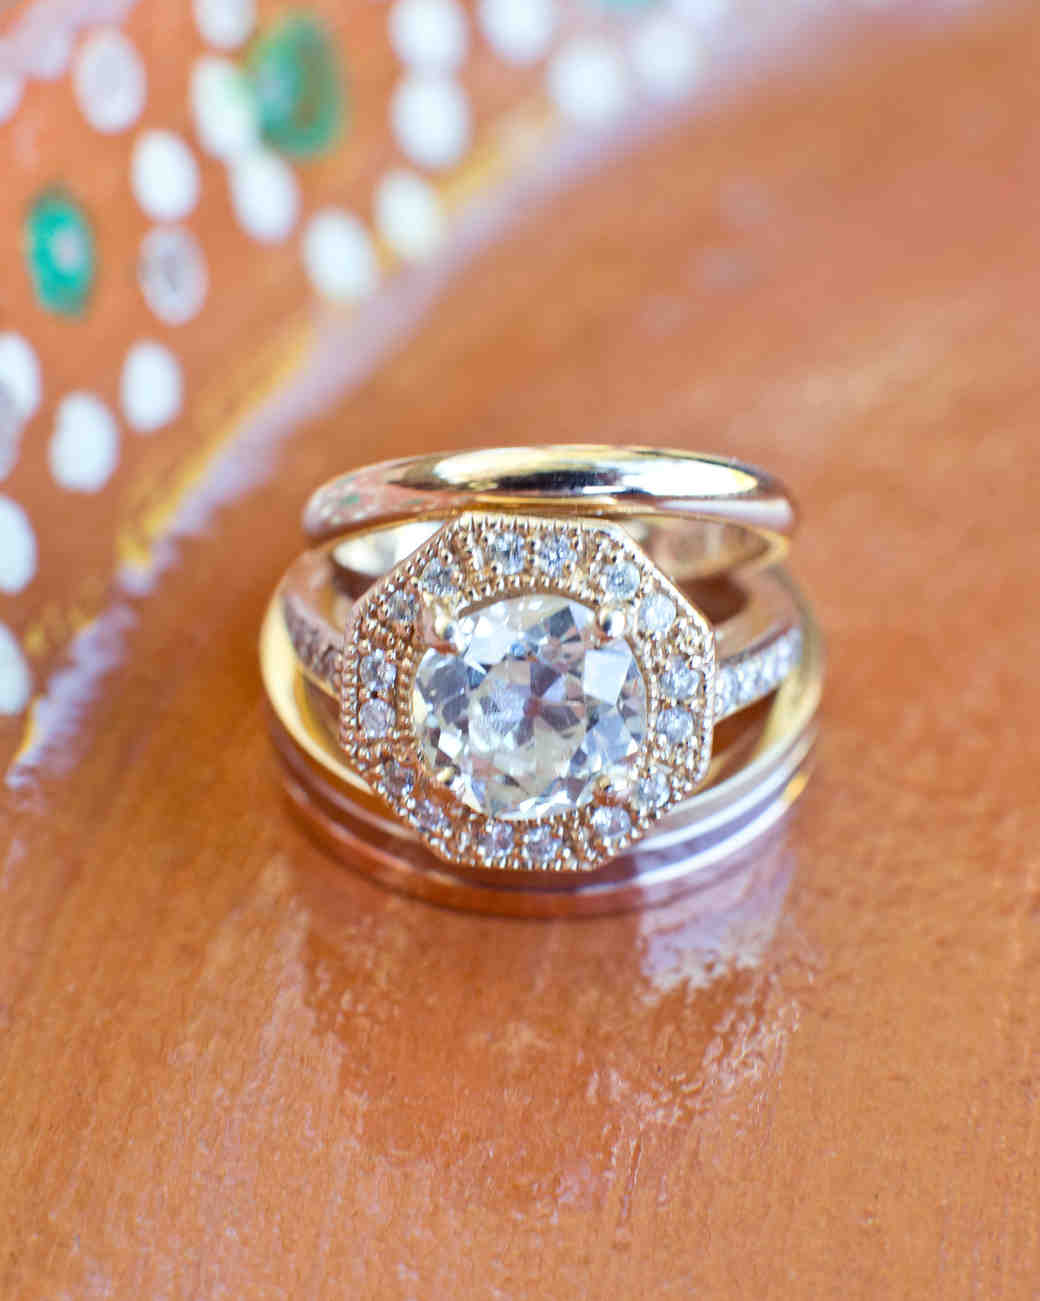 marfa texas cibolo creek ranch wedding aaron delesie wedding ring